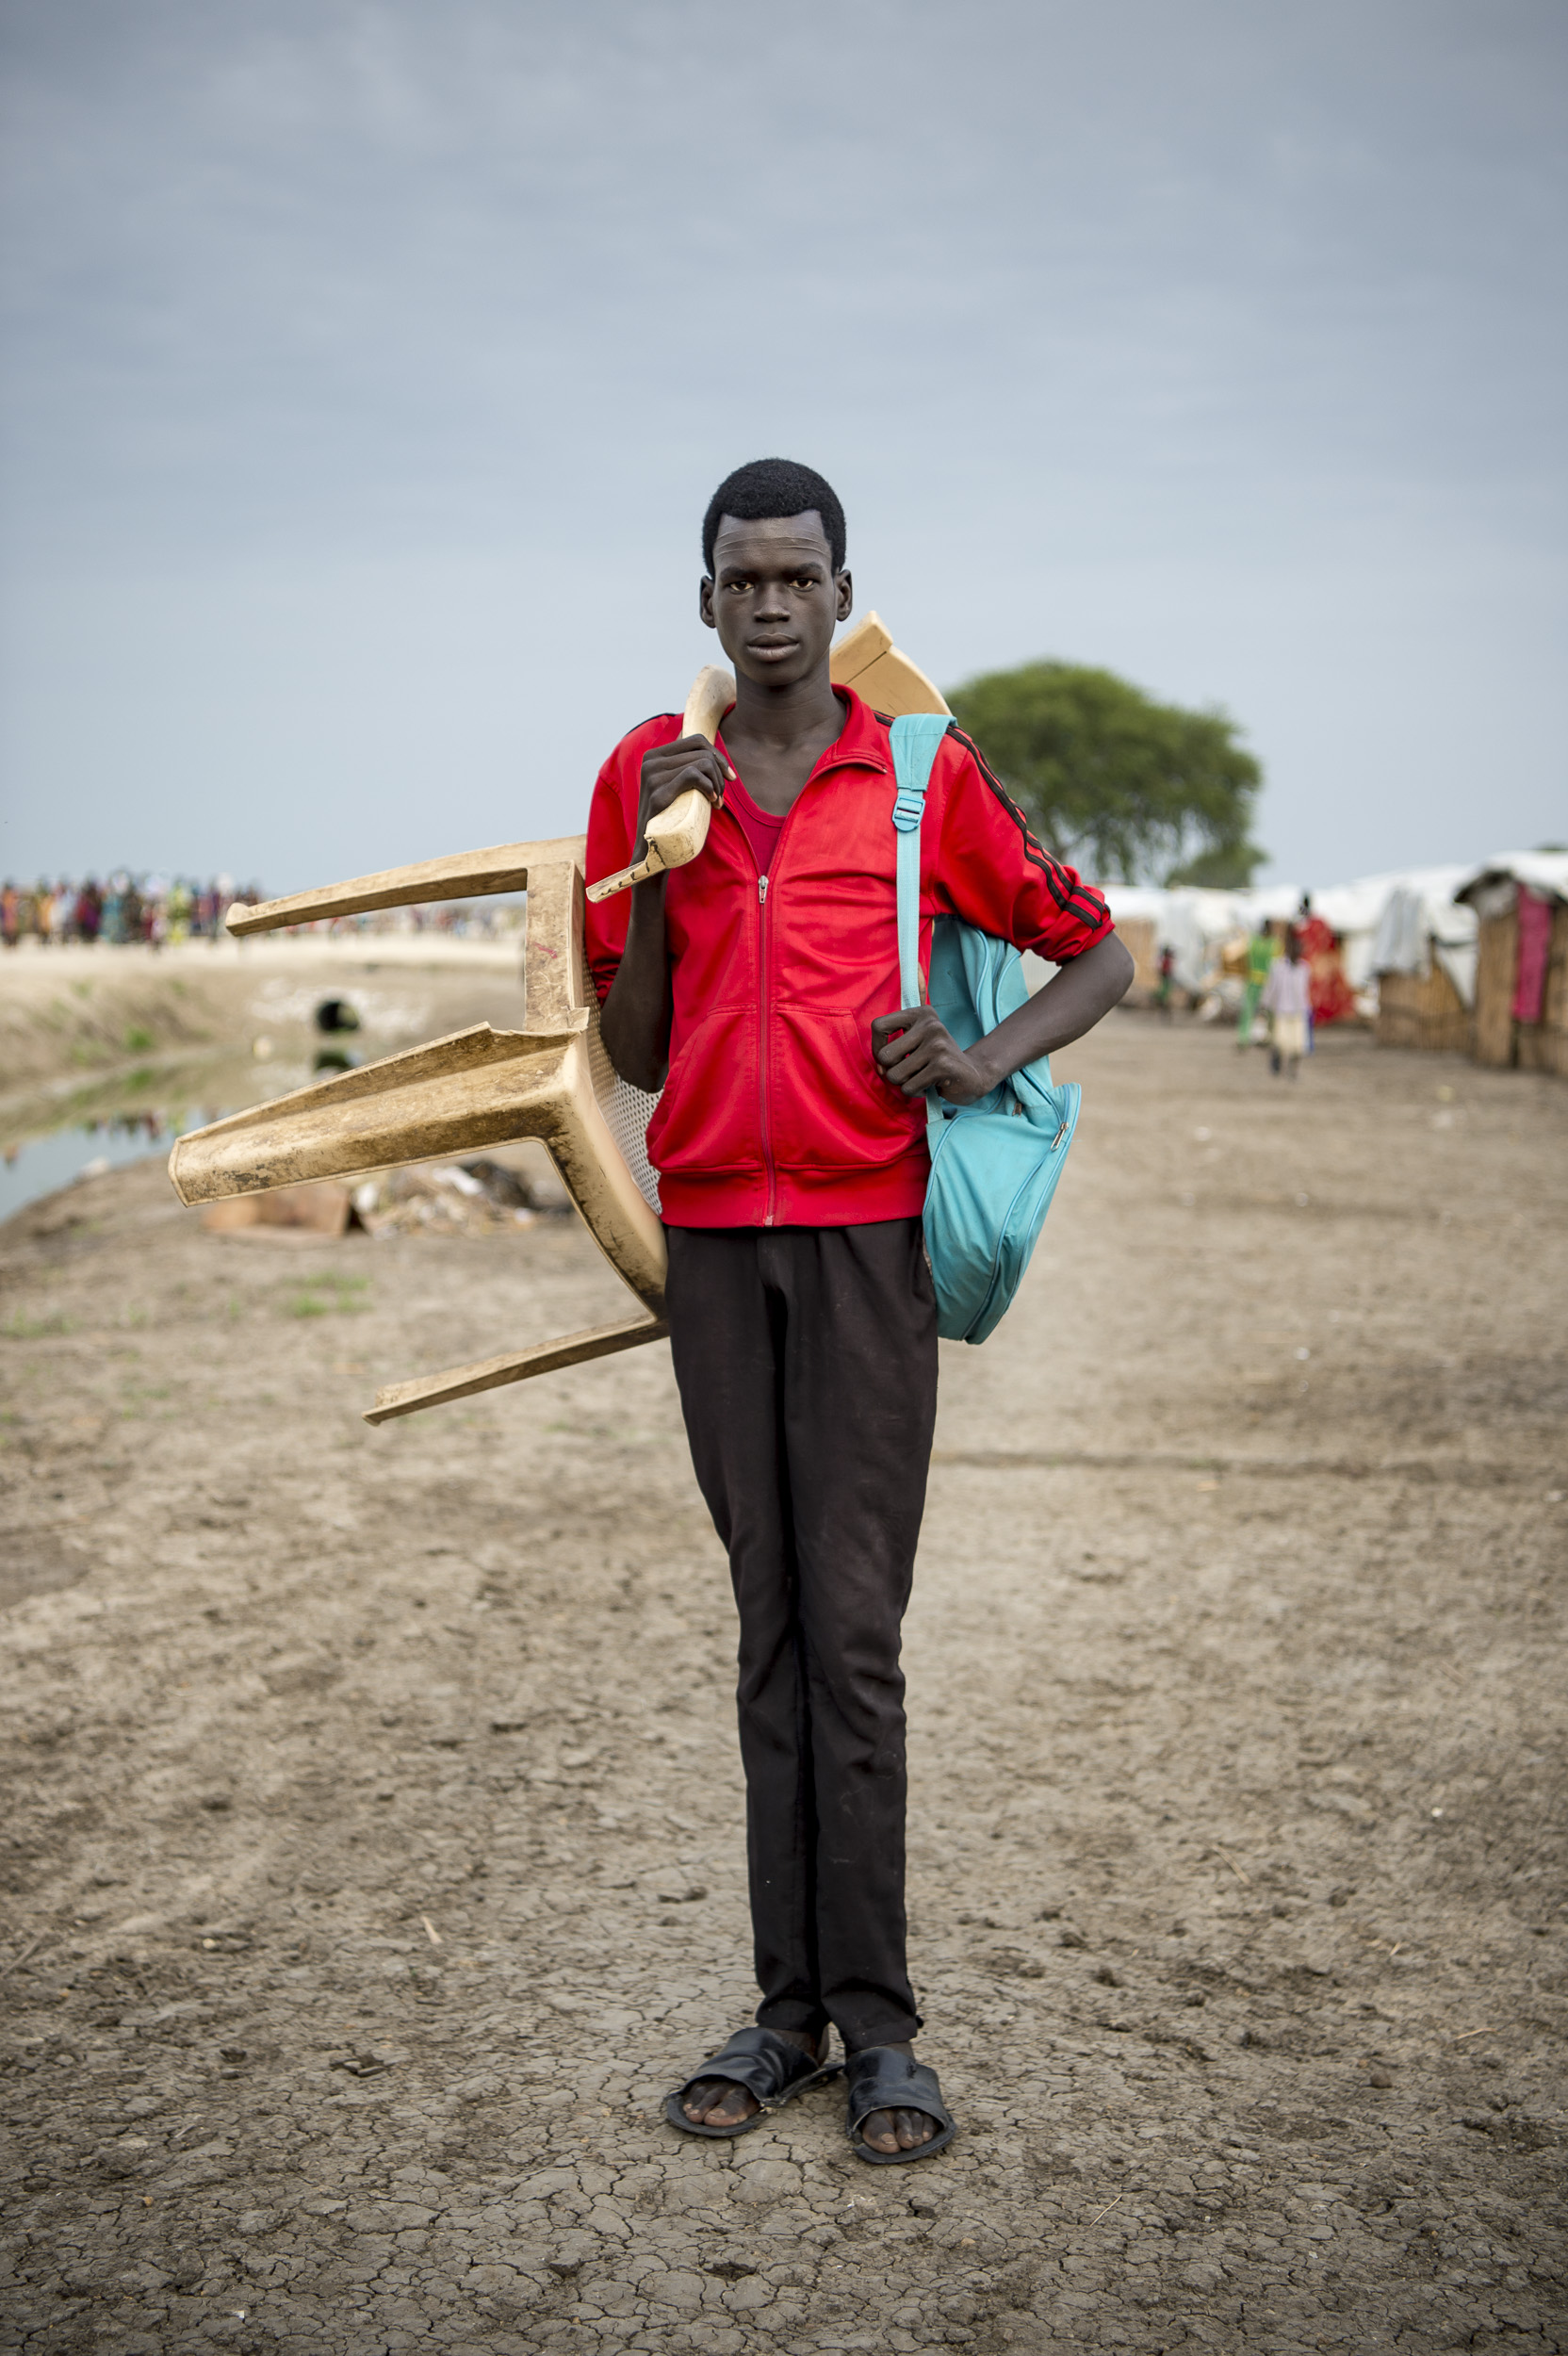 AE_SS16_UNICEF__1163.jpg